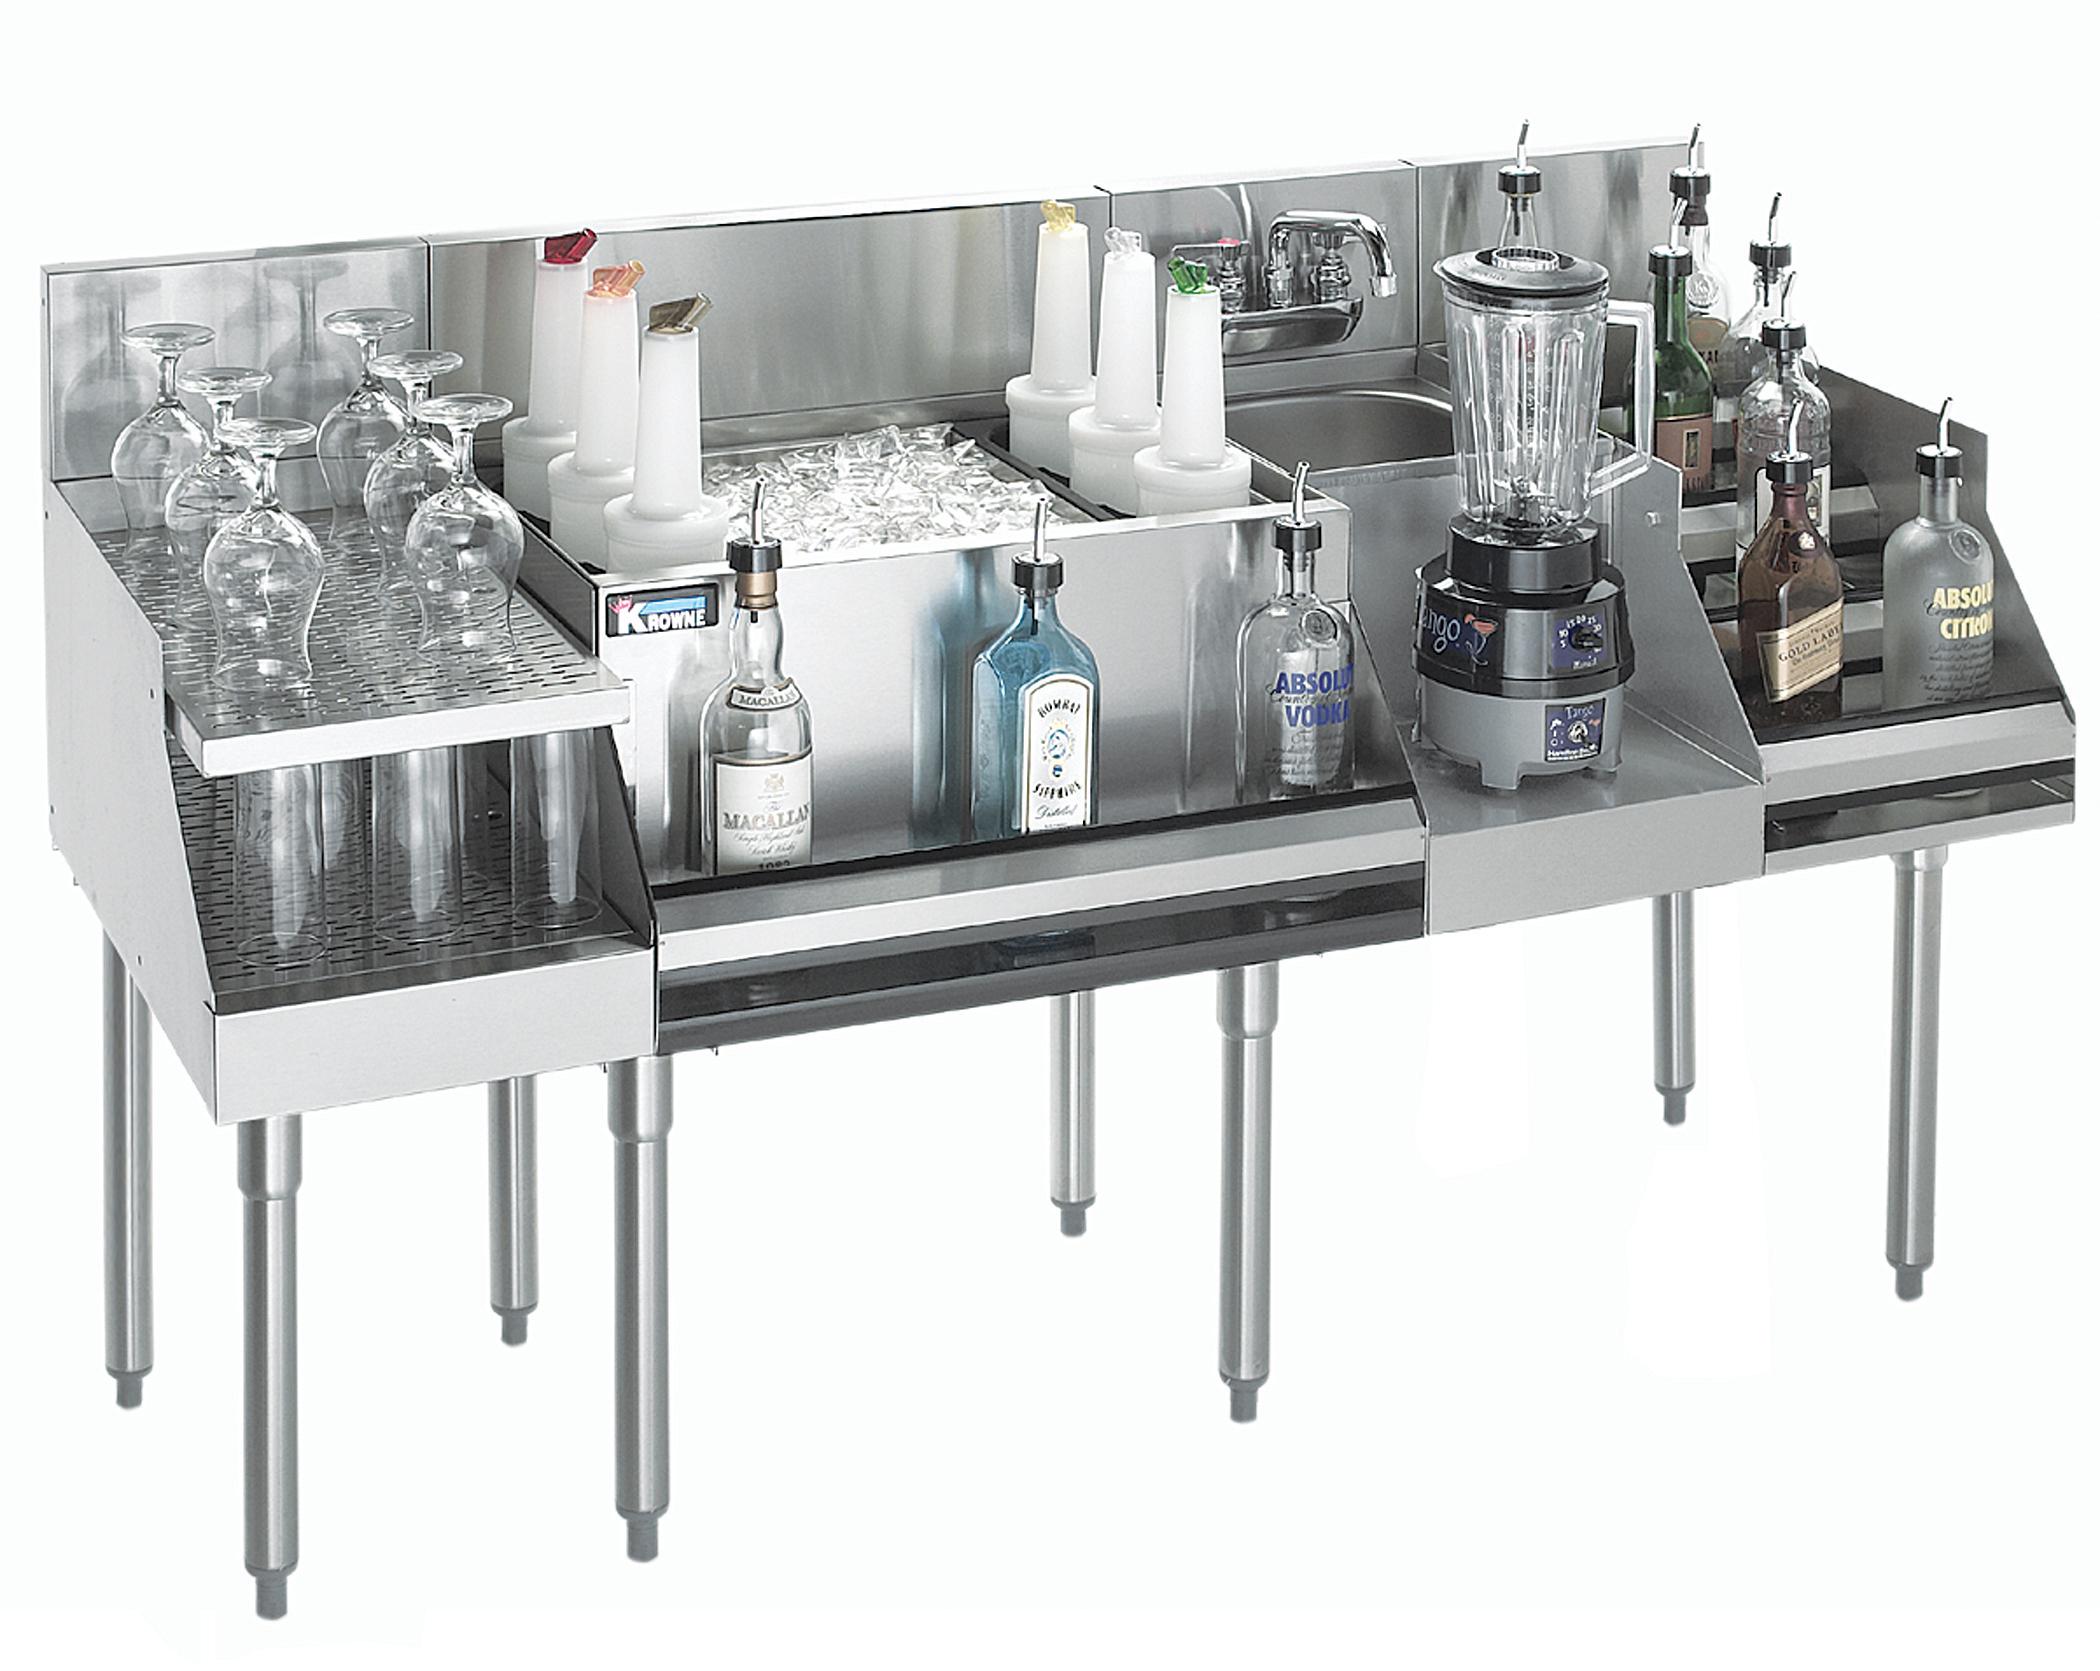 Krowne Metal KR18-W72C-10 underbar ice bin/cocktail station, blender station